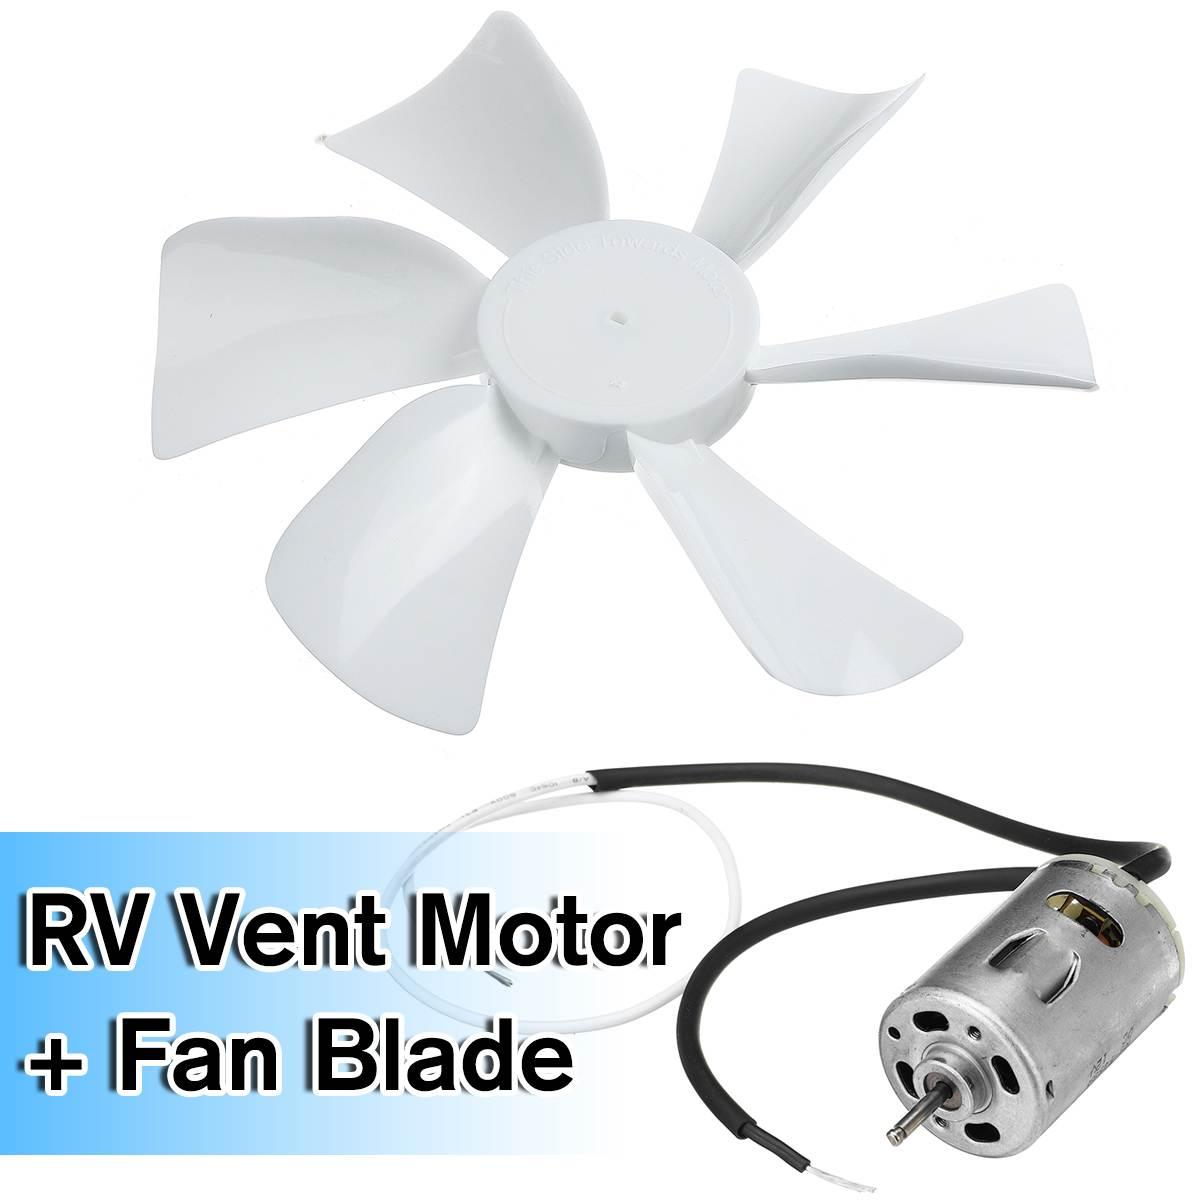 NEW 1SET 12V RV Energy-saving Motorhome Roof Vent Ventilation Cooling Exhaust Fan +Motor Noiseless For Travel Motor Homes